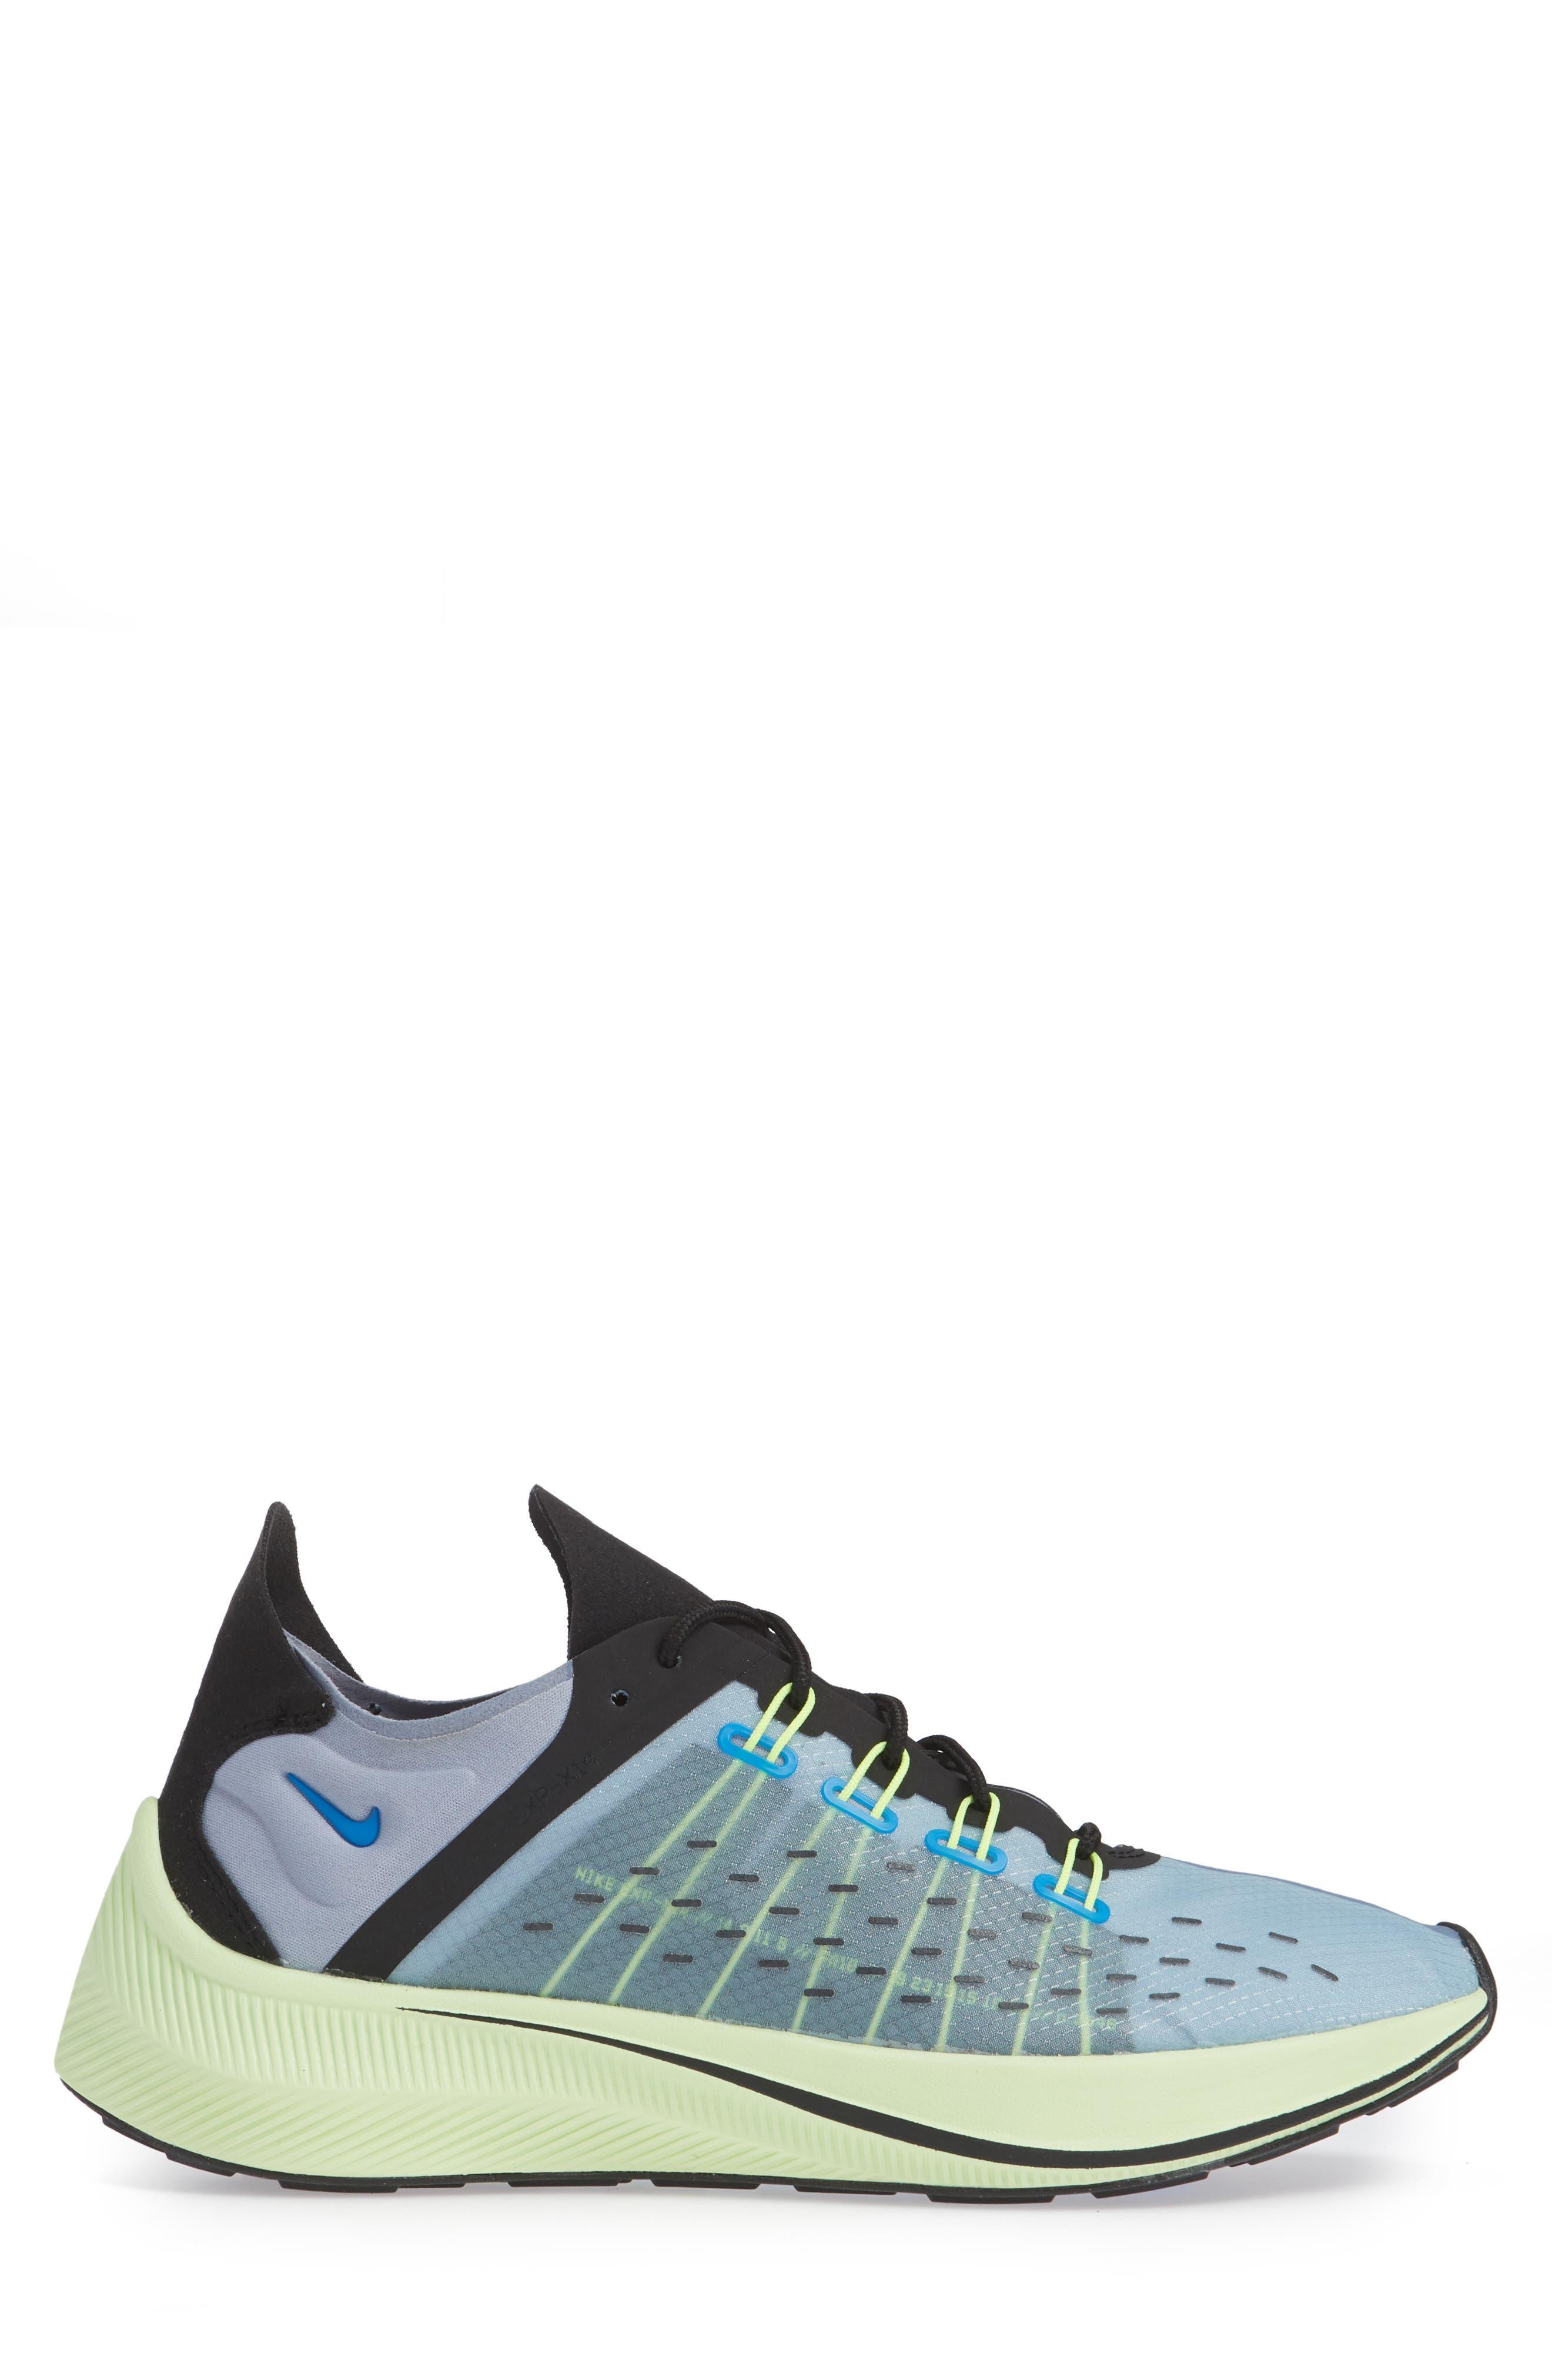 EXP-X14 Running Shoe,                             Alternate thumbnail 3, color,                             PHOTO BLUE/ GLACIER GREY